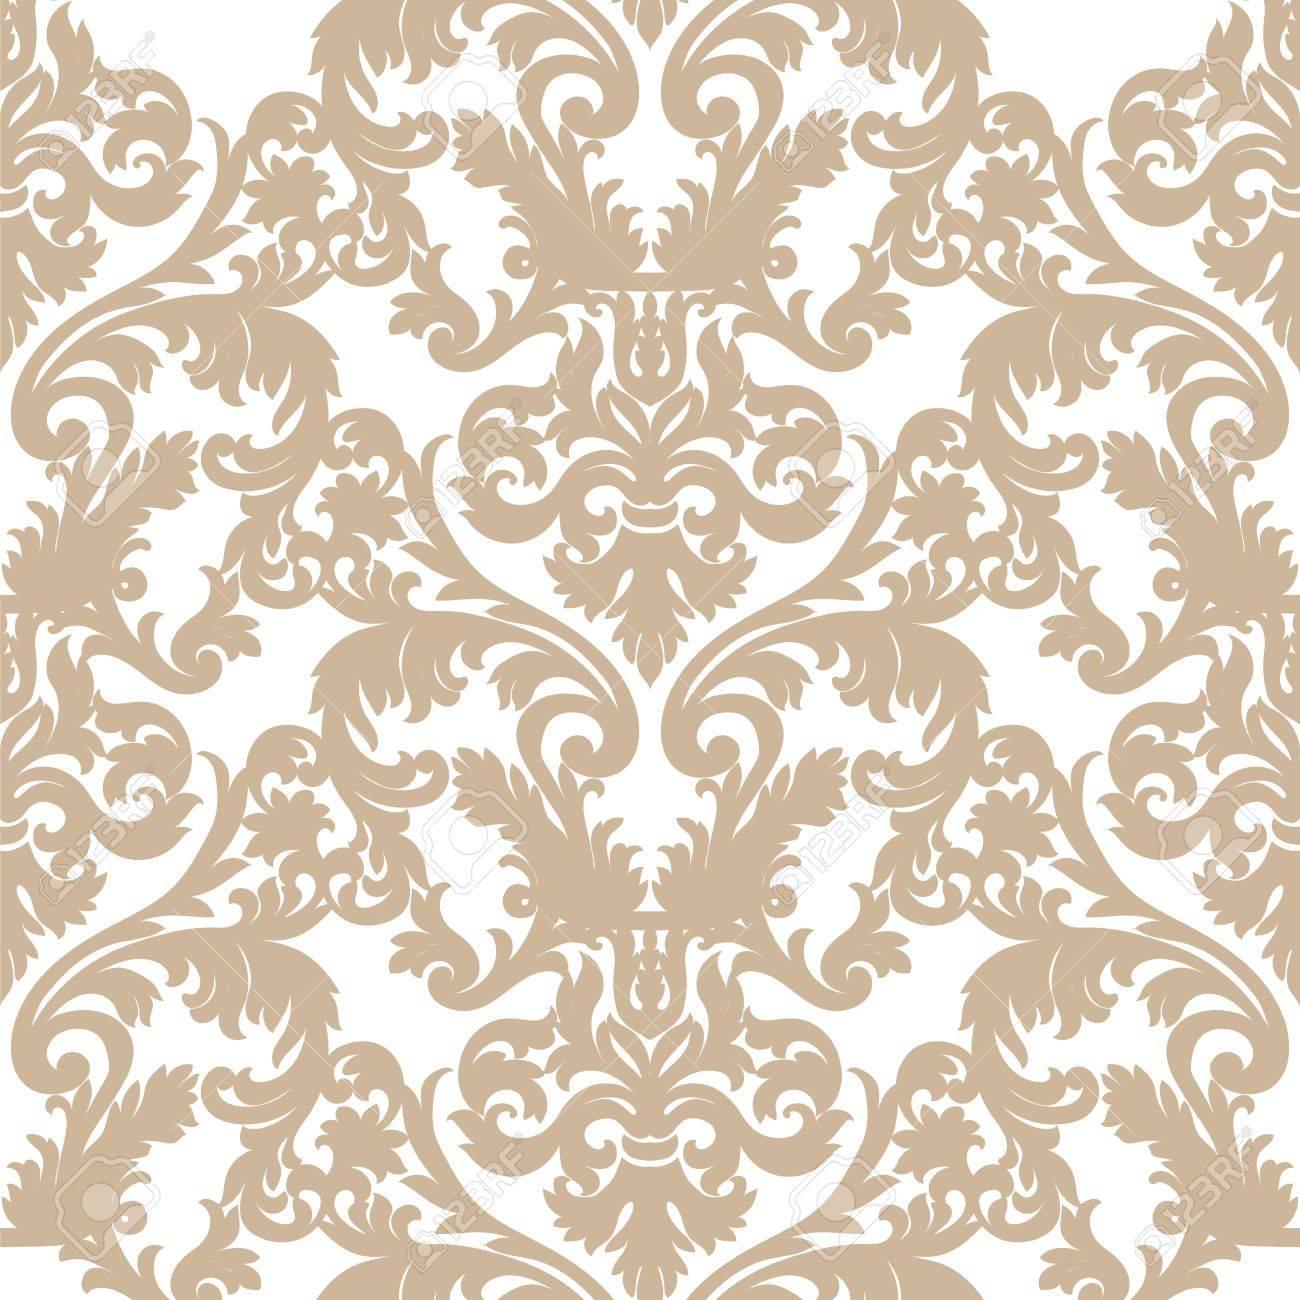 victorian wallpaper texture  Vintage Baroque Ornament Pattern. Vector Luxury Damask Decor ...